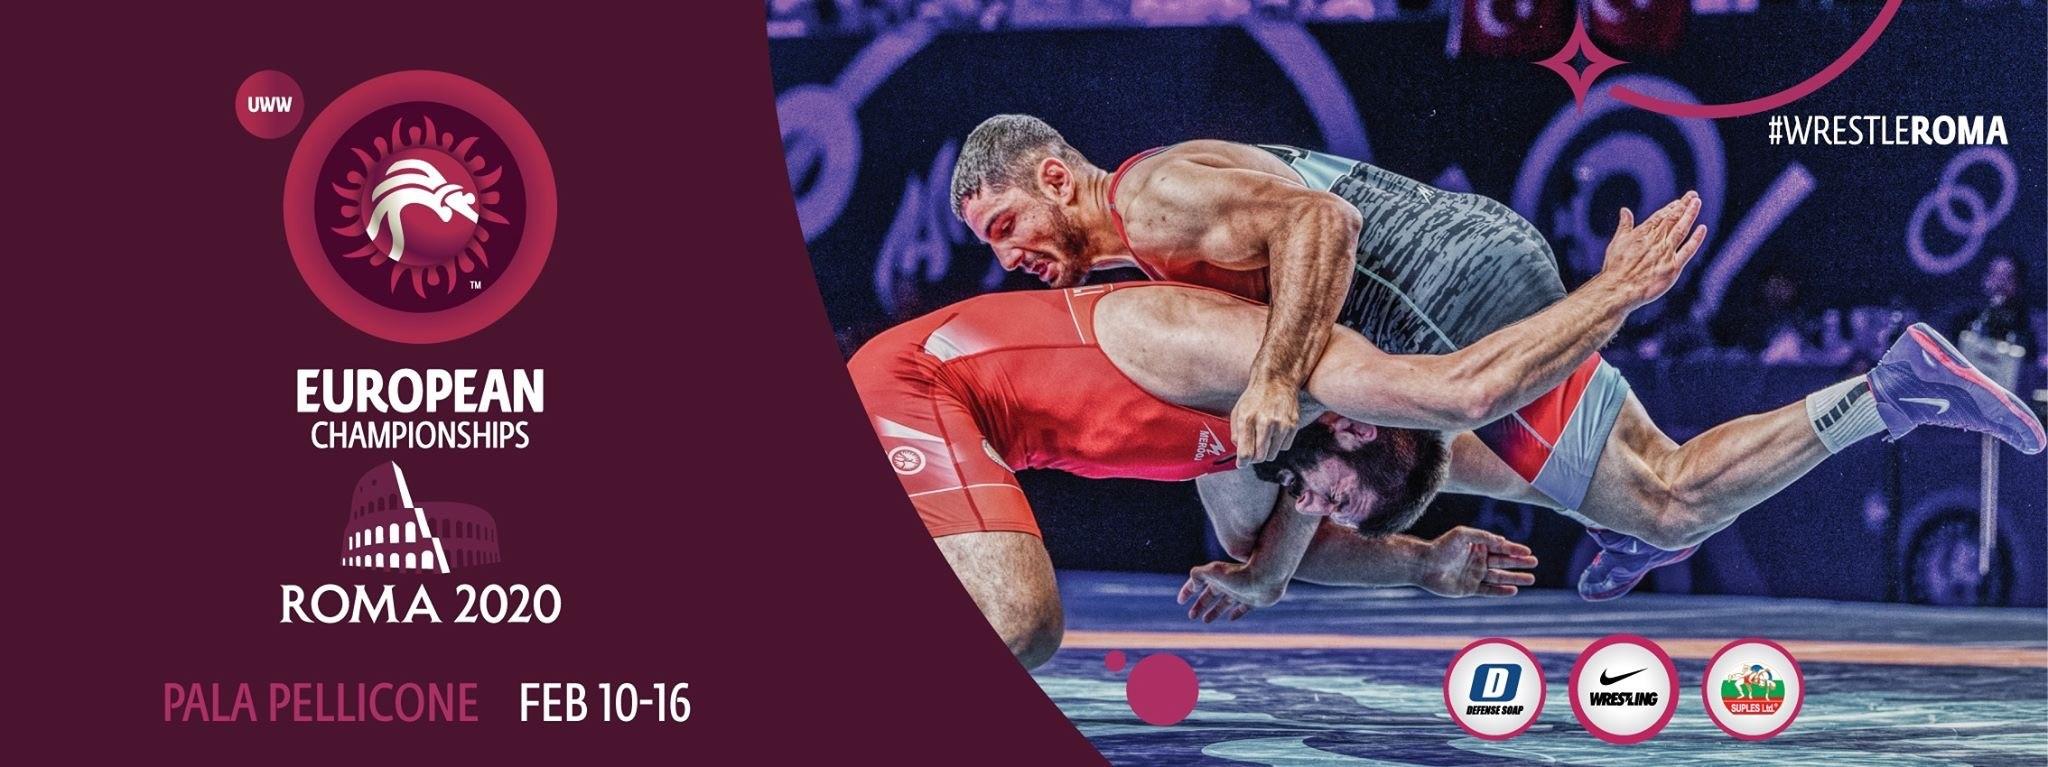 European Championchips | Ringen | Roma 2020 | Pala Pellicone | Februar